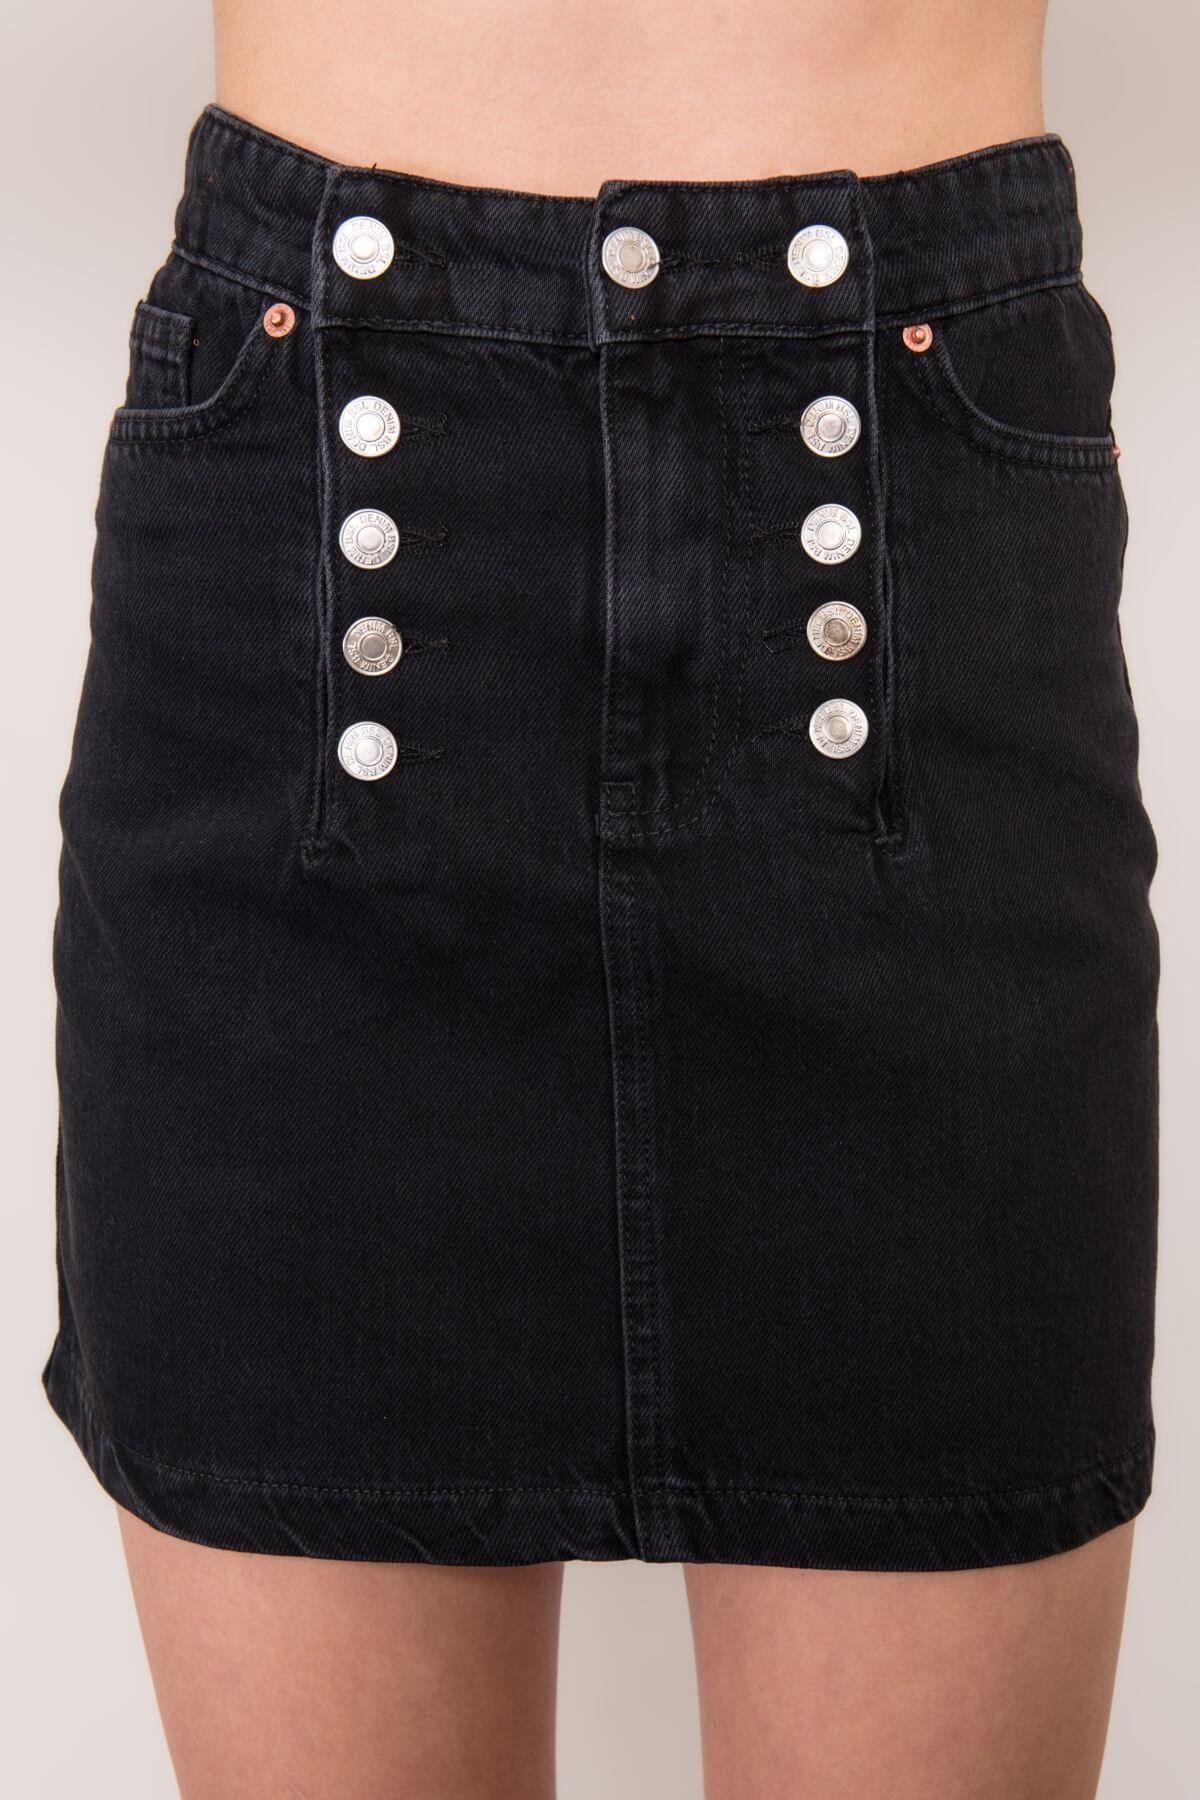 Čierna džínsová sukňa s ozdobnými gombíkmi - S